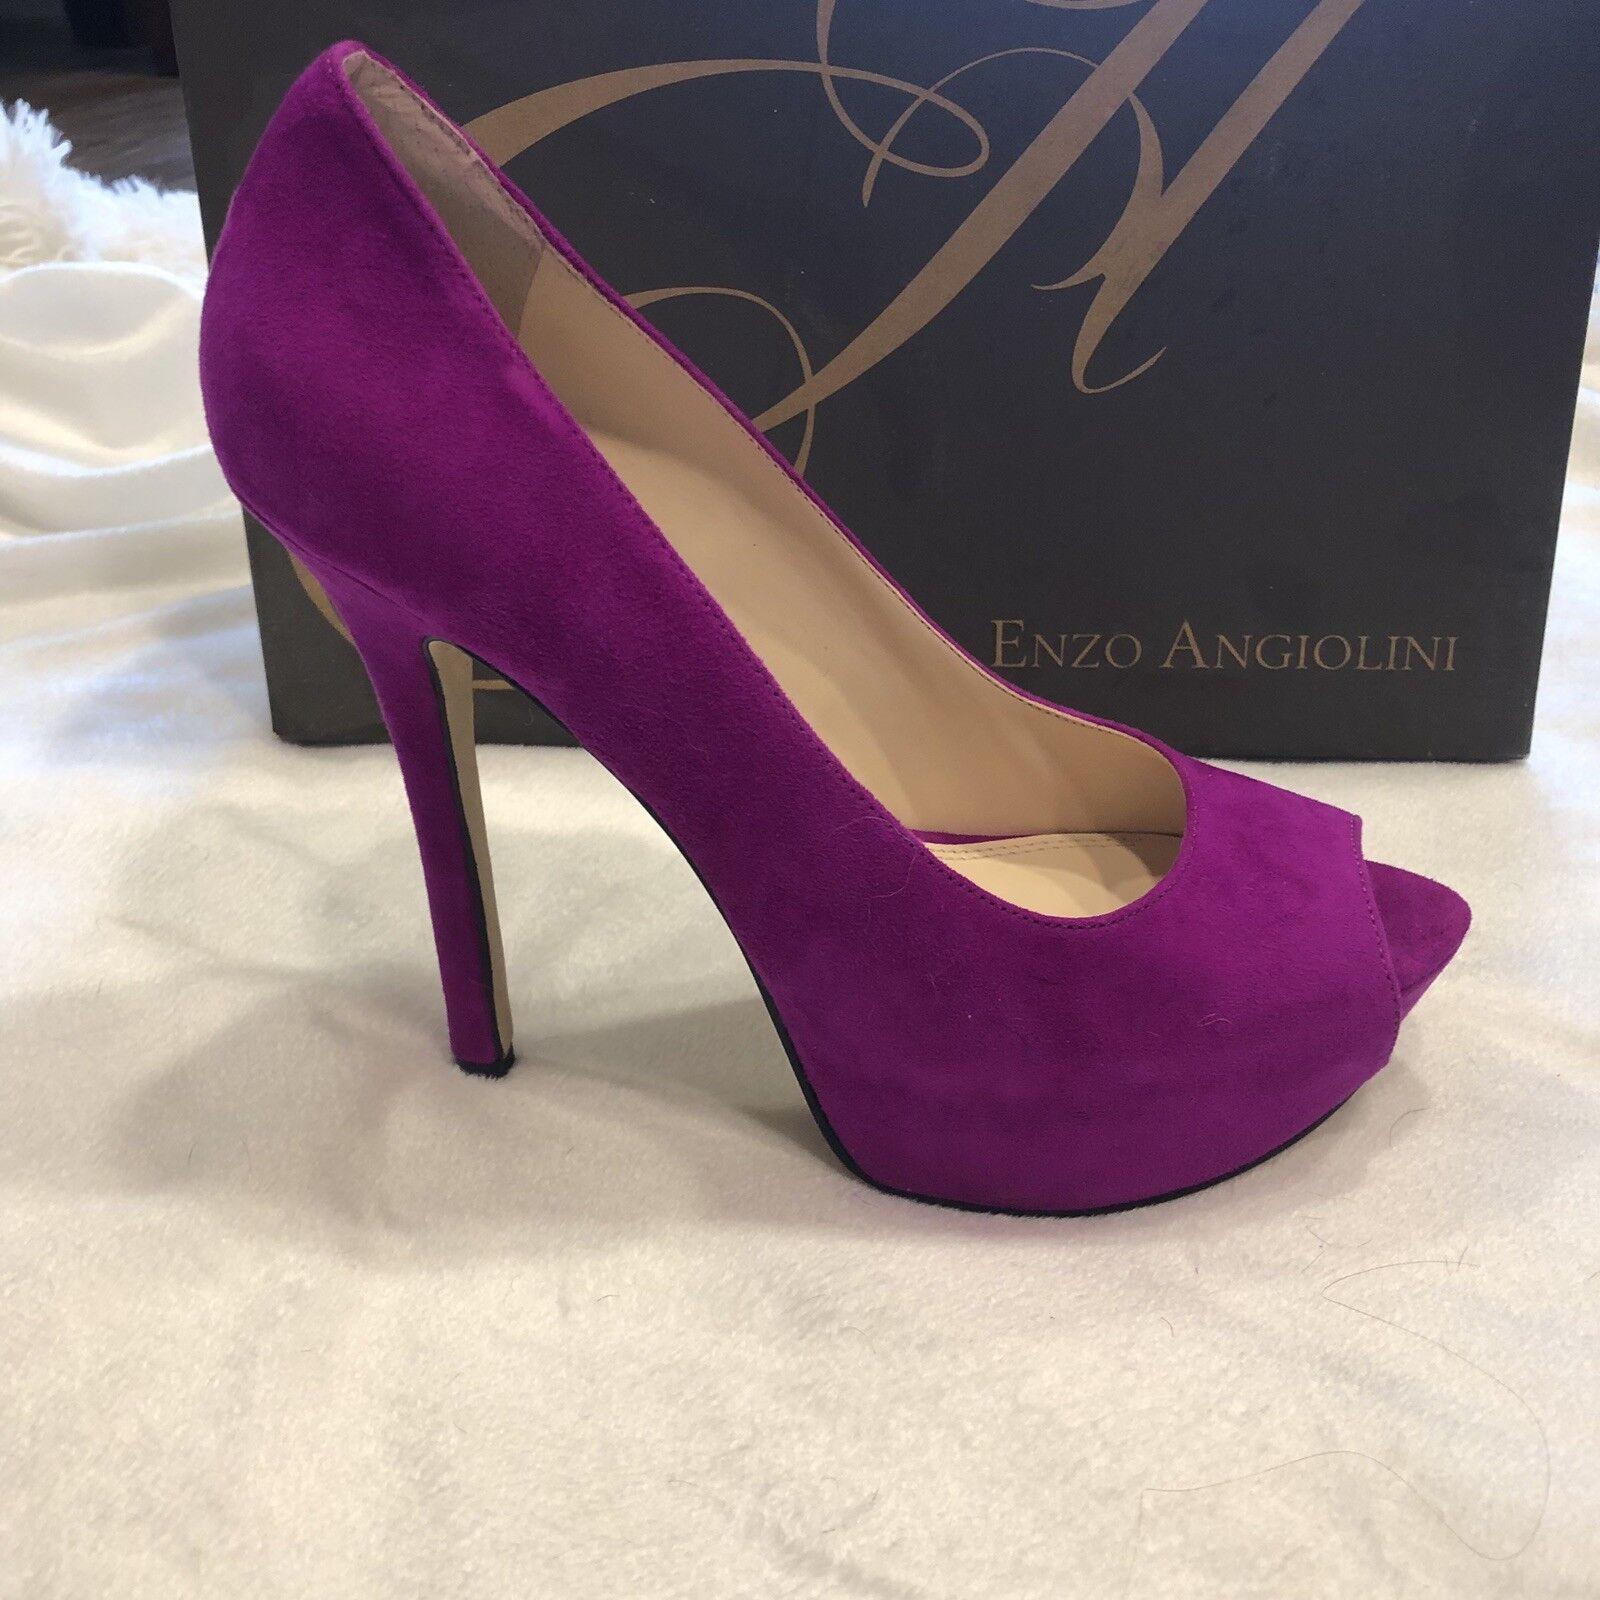 Enzo Angiolini Eatanen Heels 7 M Dark Pink Suede Leather Pumps shoes purple